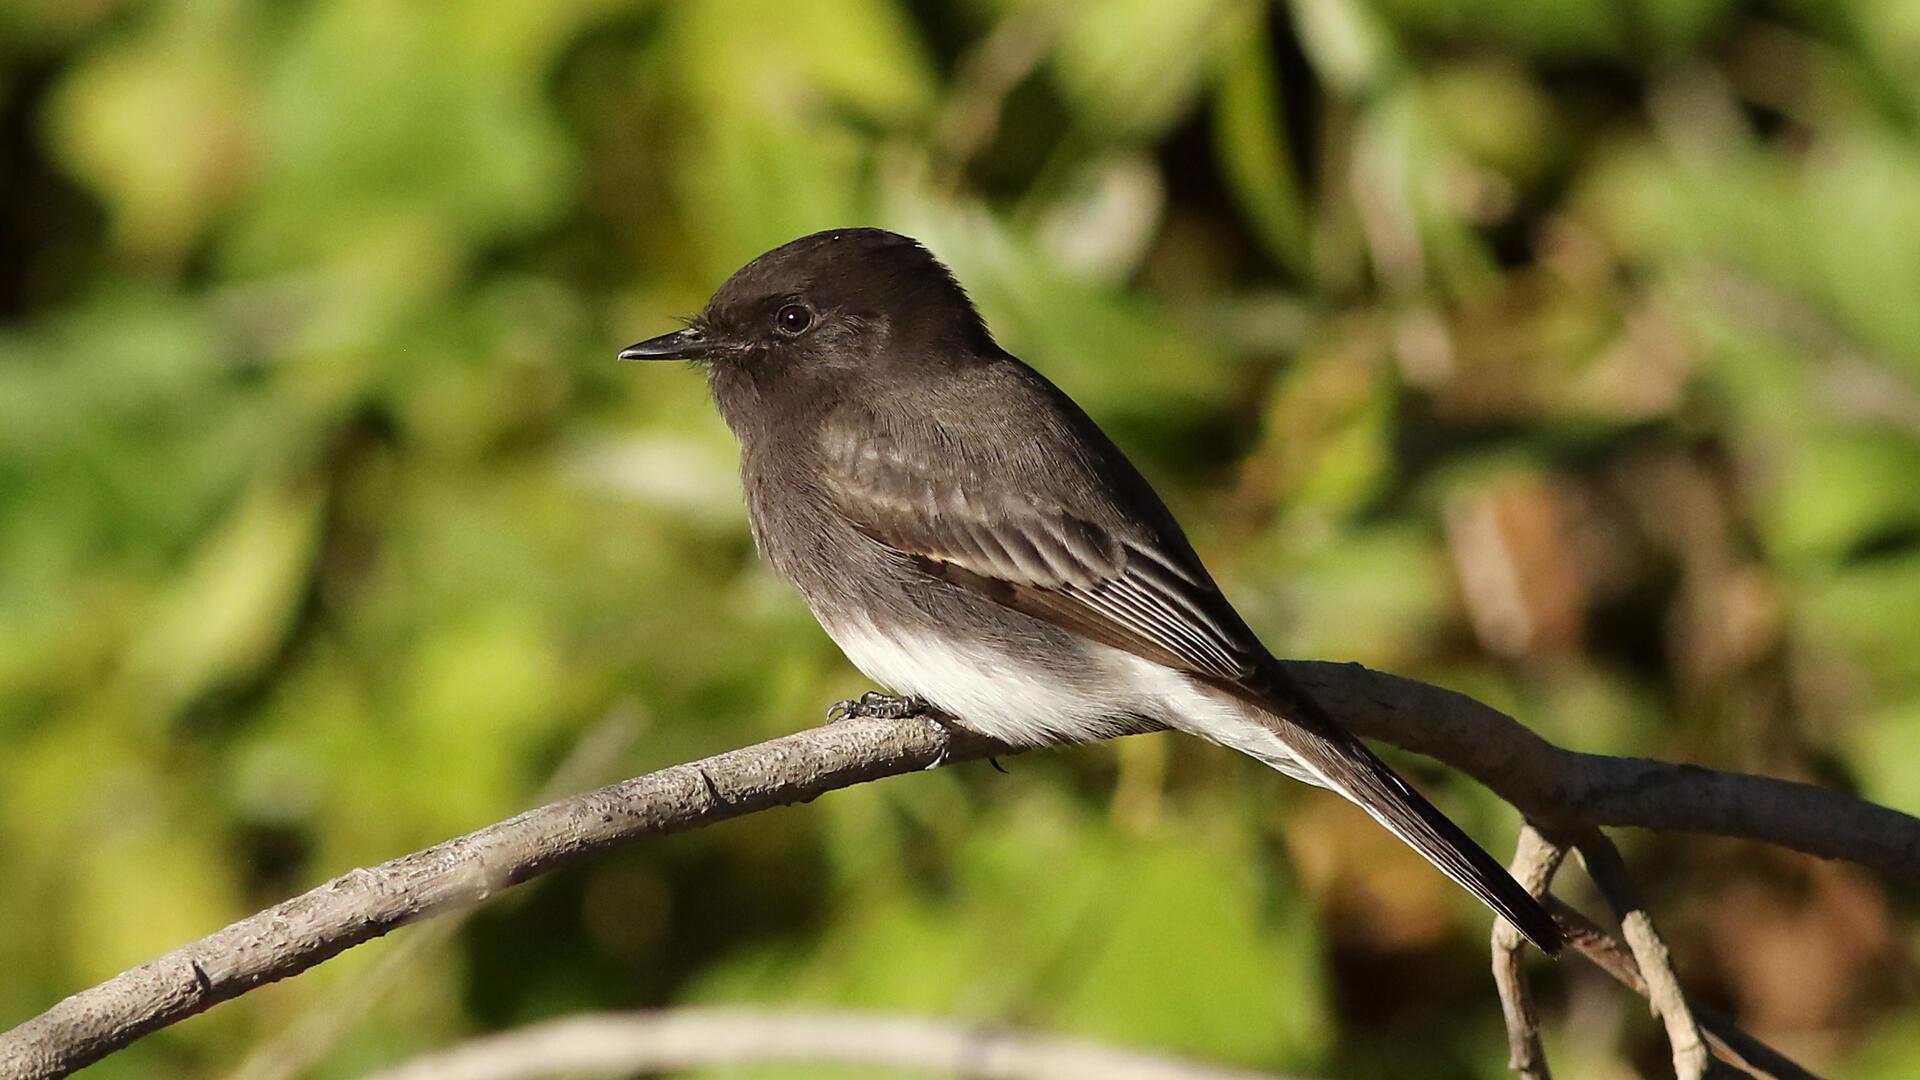 Black Phoebe Audubon Field Guide